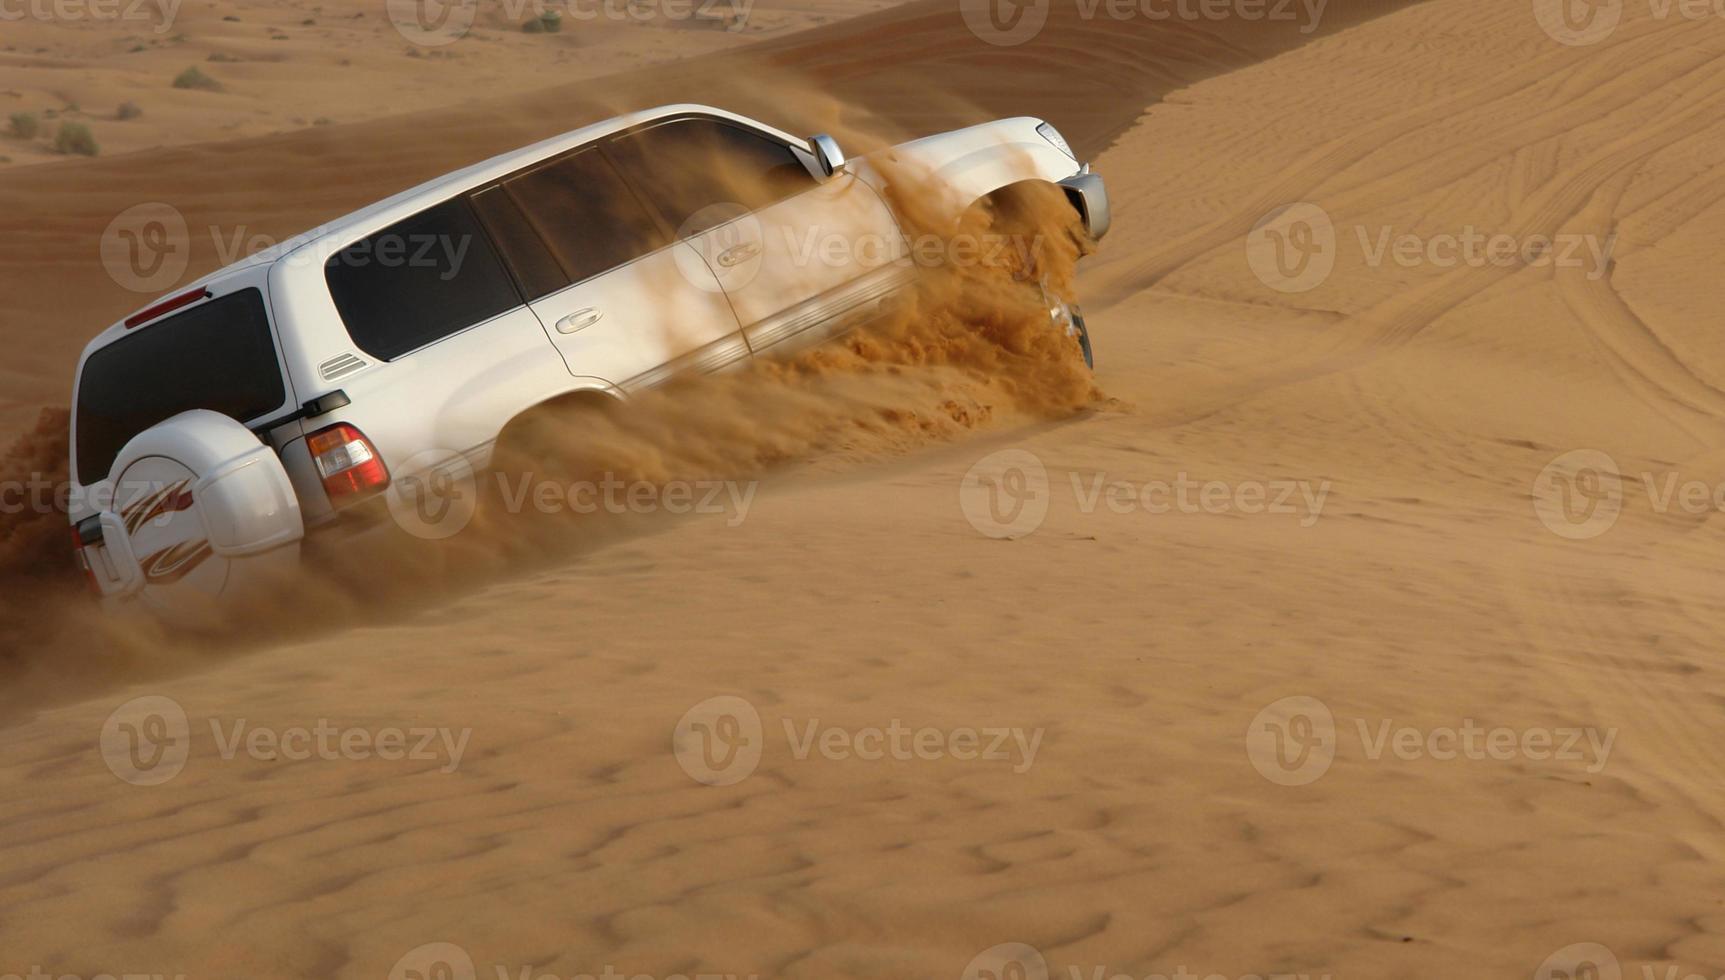 avventura nel deserto foto